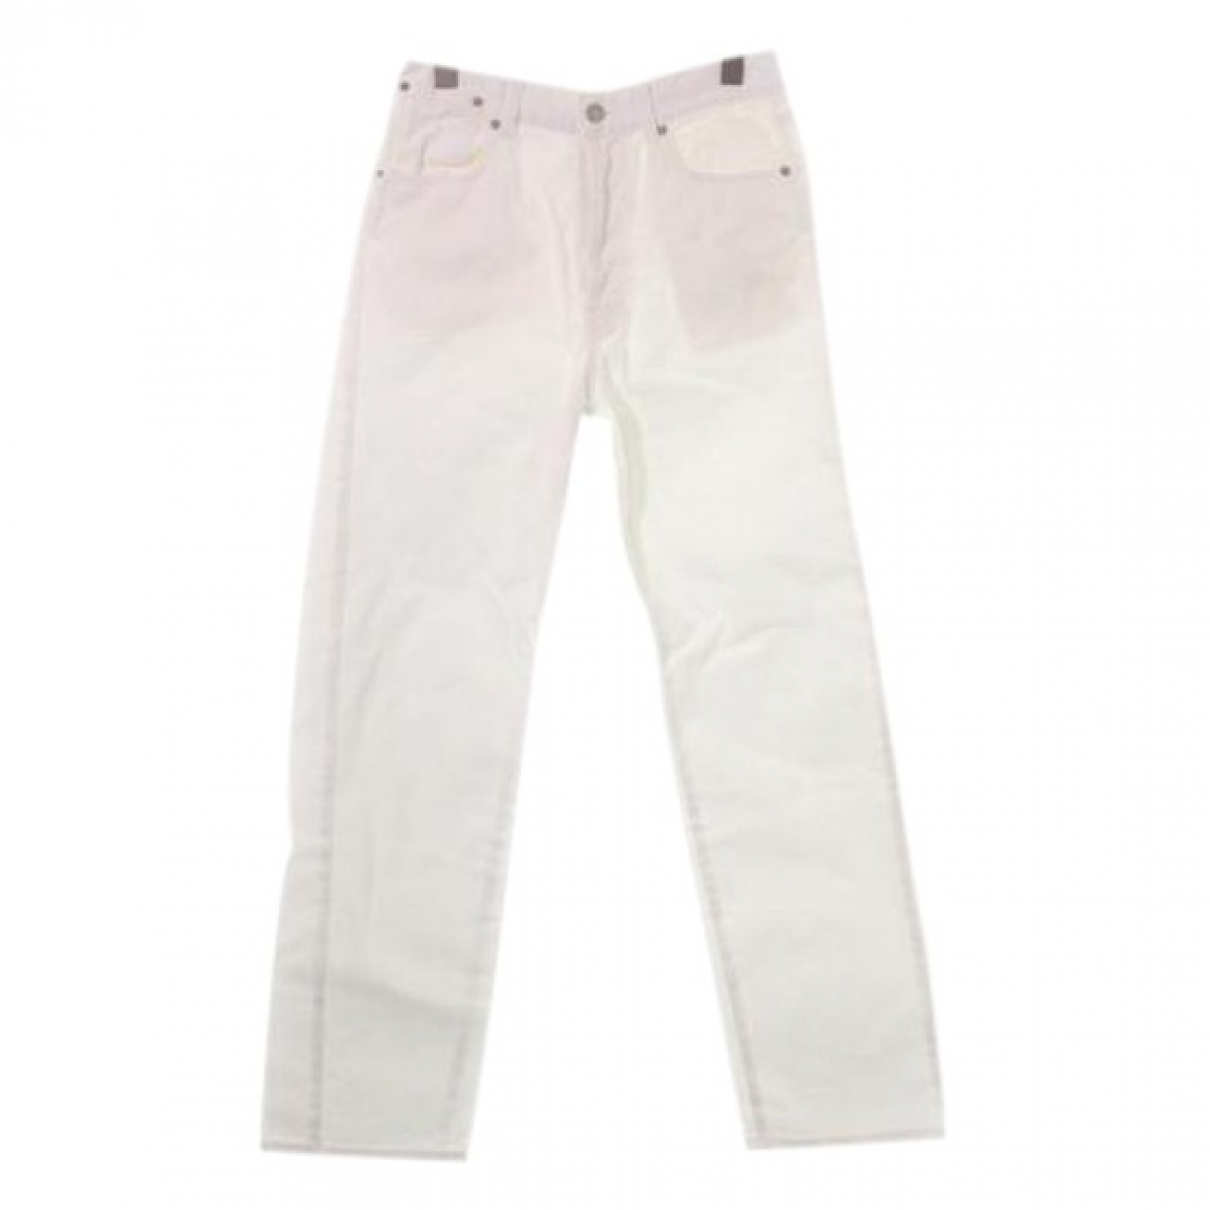 Dries Van Noten \N White Cotton Jeans for Women 26 US